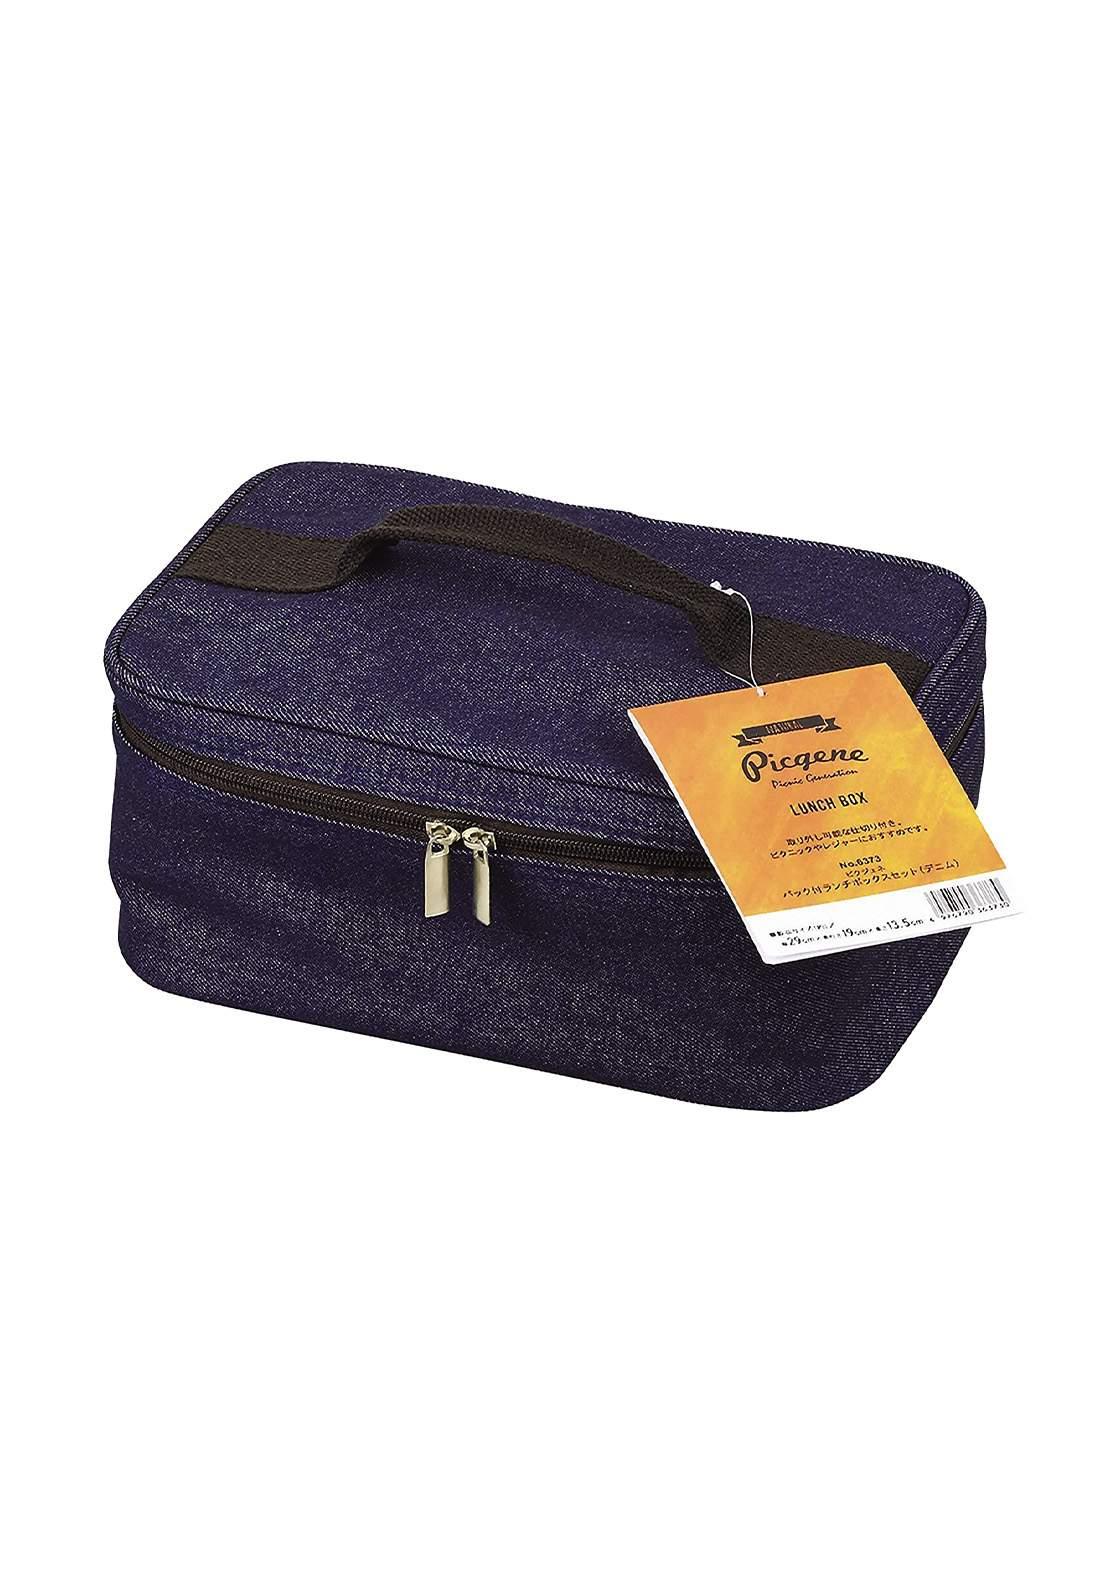 Pearl Metal D-6373 Bento Box, Denim  Lunch Box Set with Bag  صندوق طعام مع حقيبة